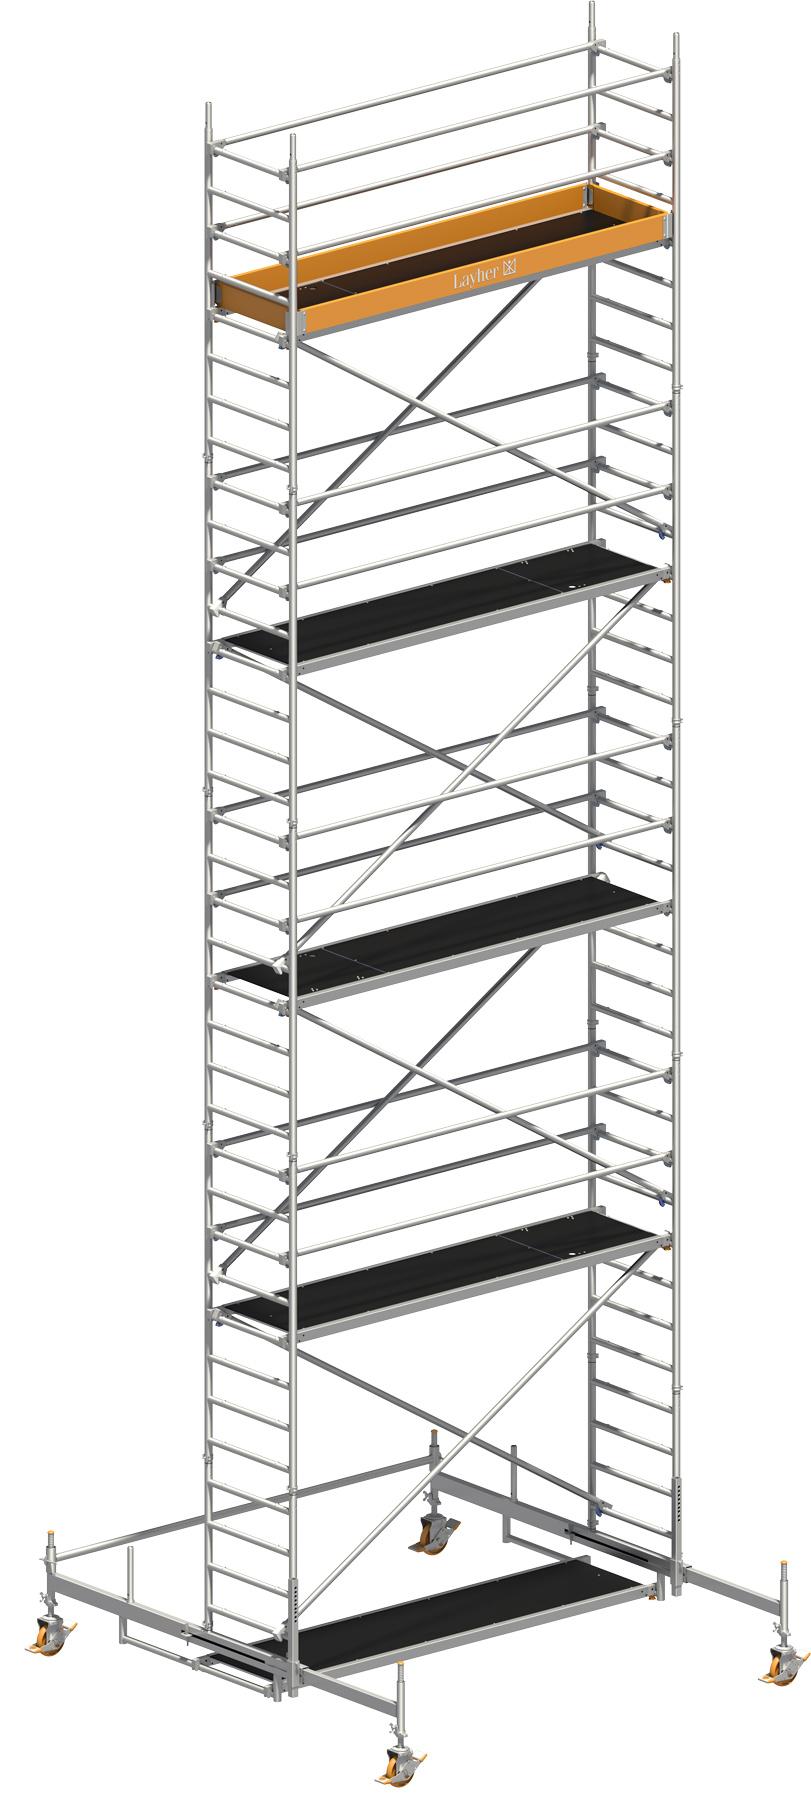 Fahrgerüst Layher Uni Standard P2 1401108